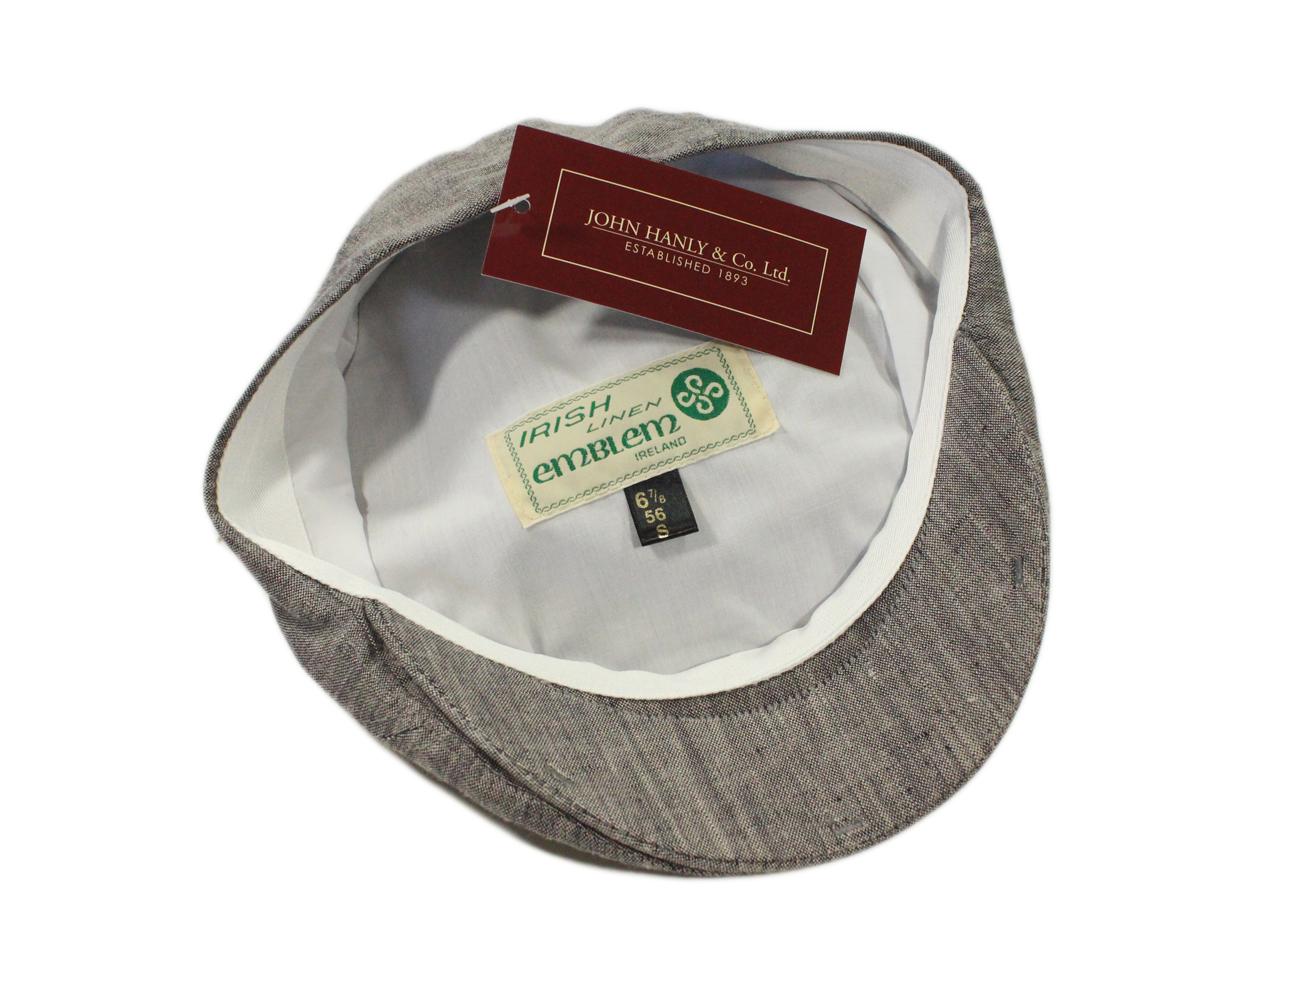 New Mens Summer Hat Irish Linen Made in Ireland John Hanly   Co.  df5e82d82fa